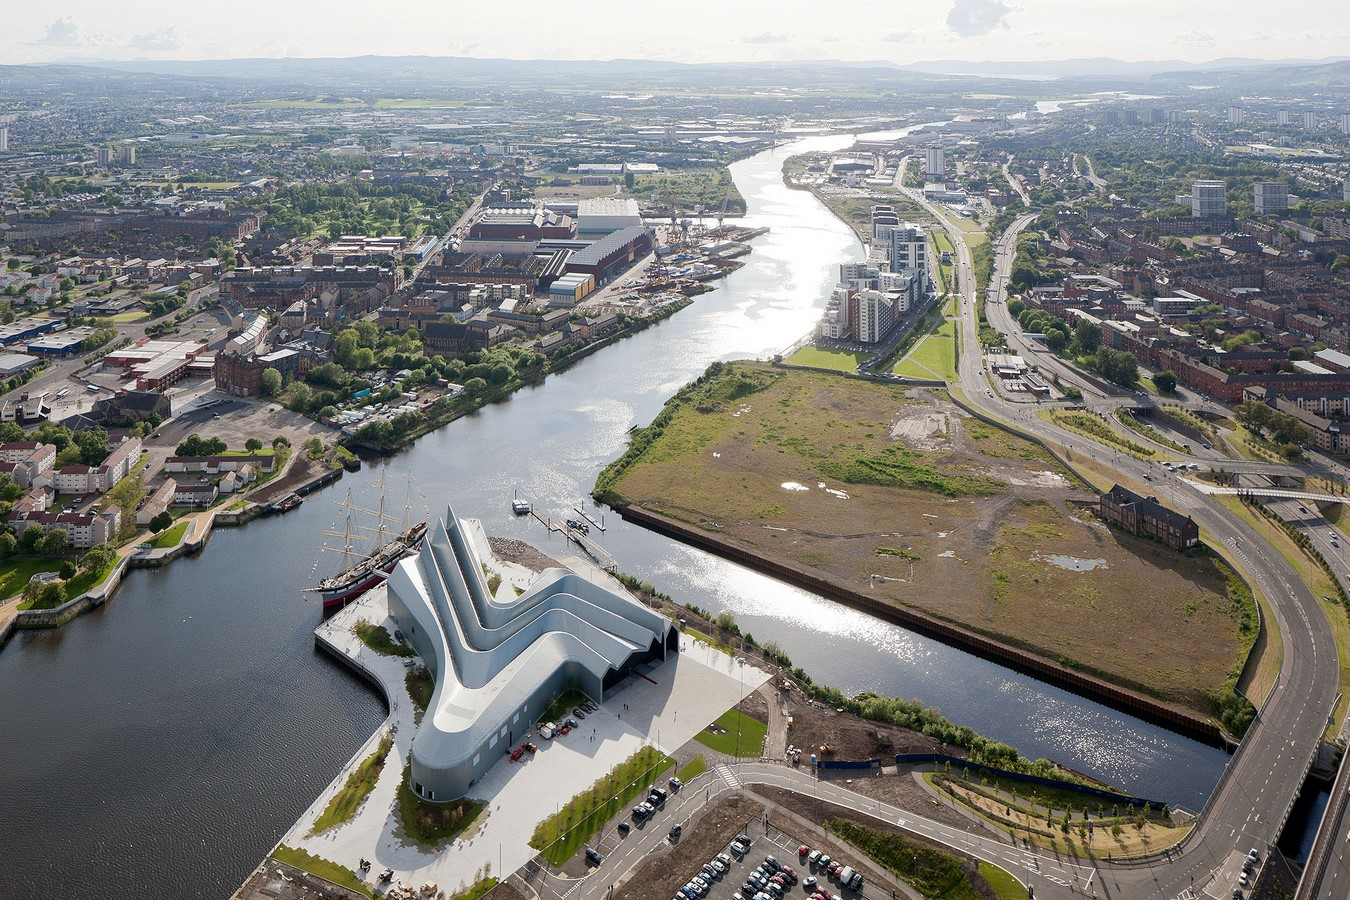 Glasgow Riverside Museum of Transport by Zaha Hadid : The Zig-Zag Profile - Sheet1